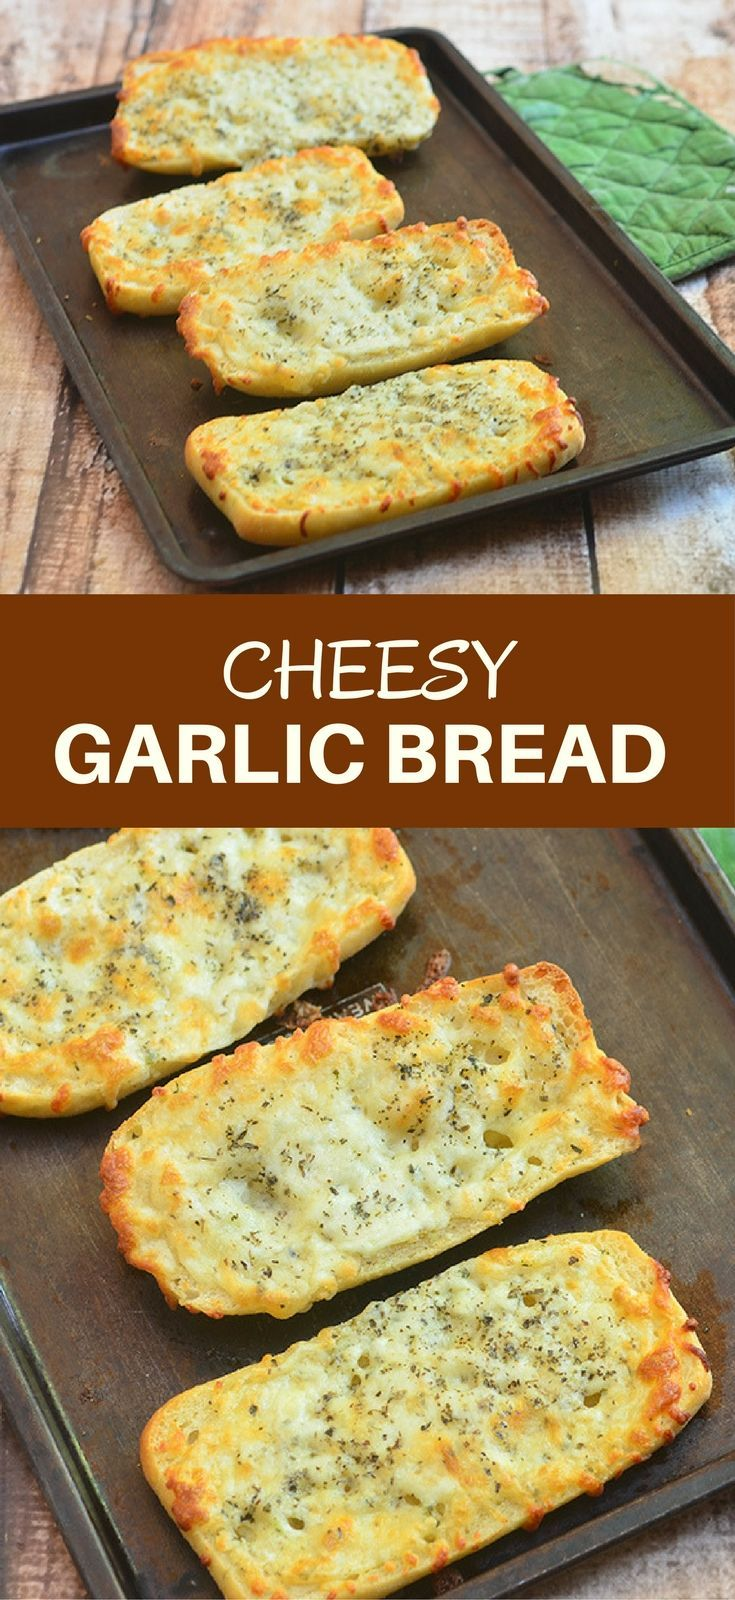 25+ best ideas about Cheesy garlic bread on Pinterest ...